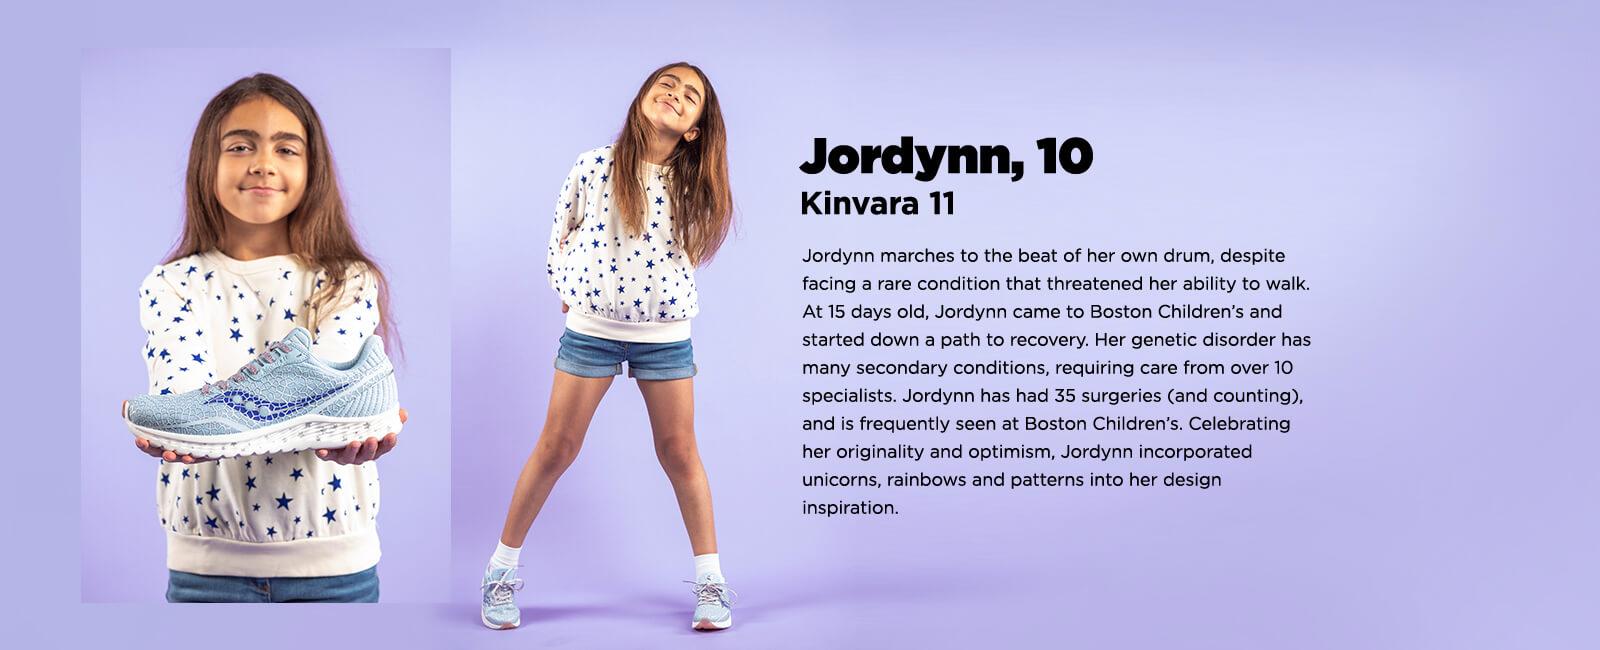 Jordynn, 10 Years old Boston Childrens Hospital